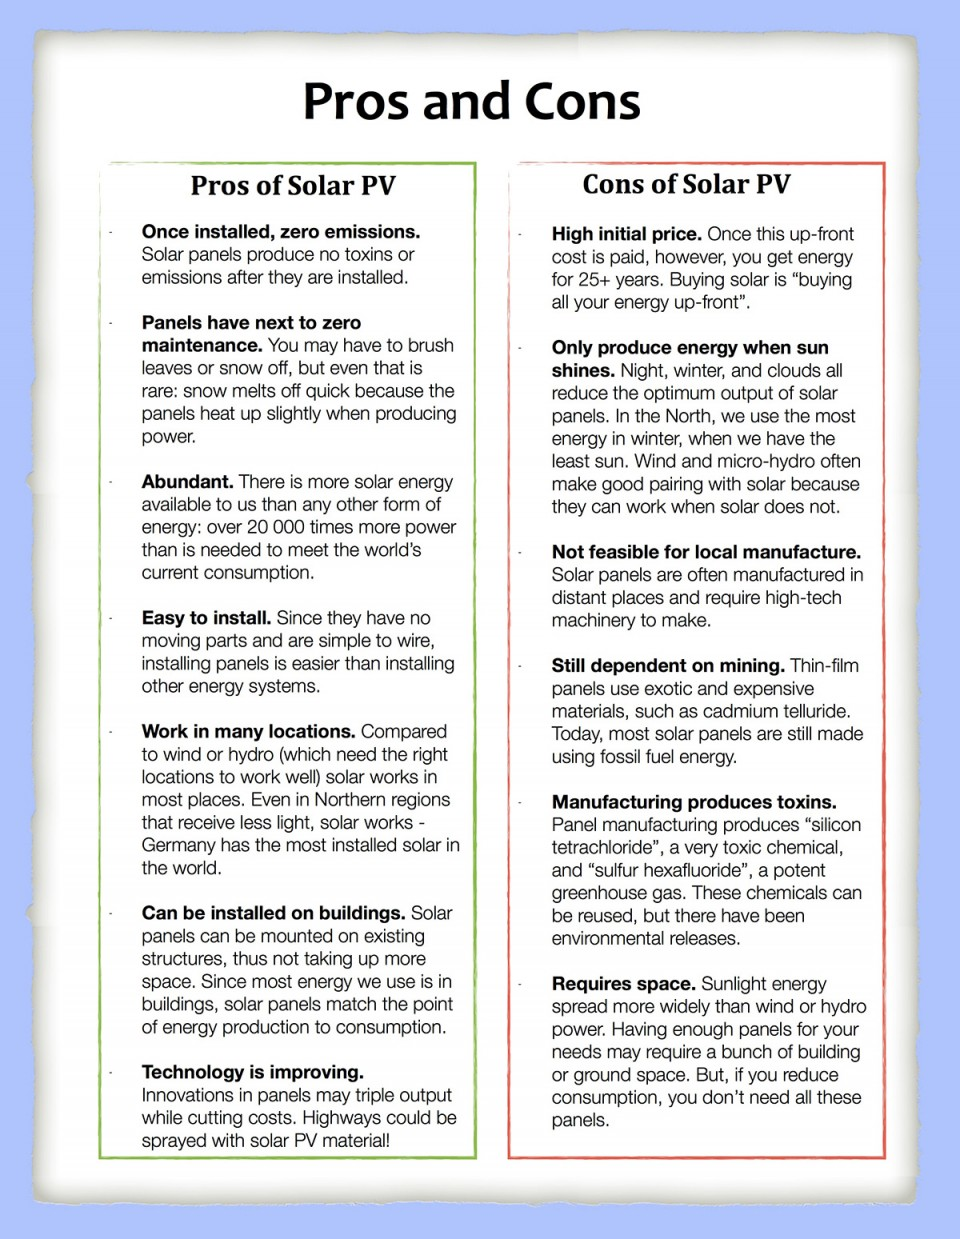 006 Solarposter6 Should Students Wear School Uniforms Essay Impressive Pdf High Have To 960